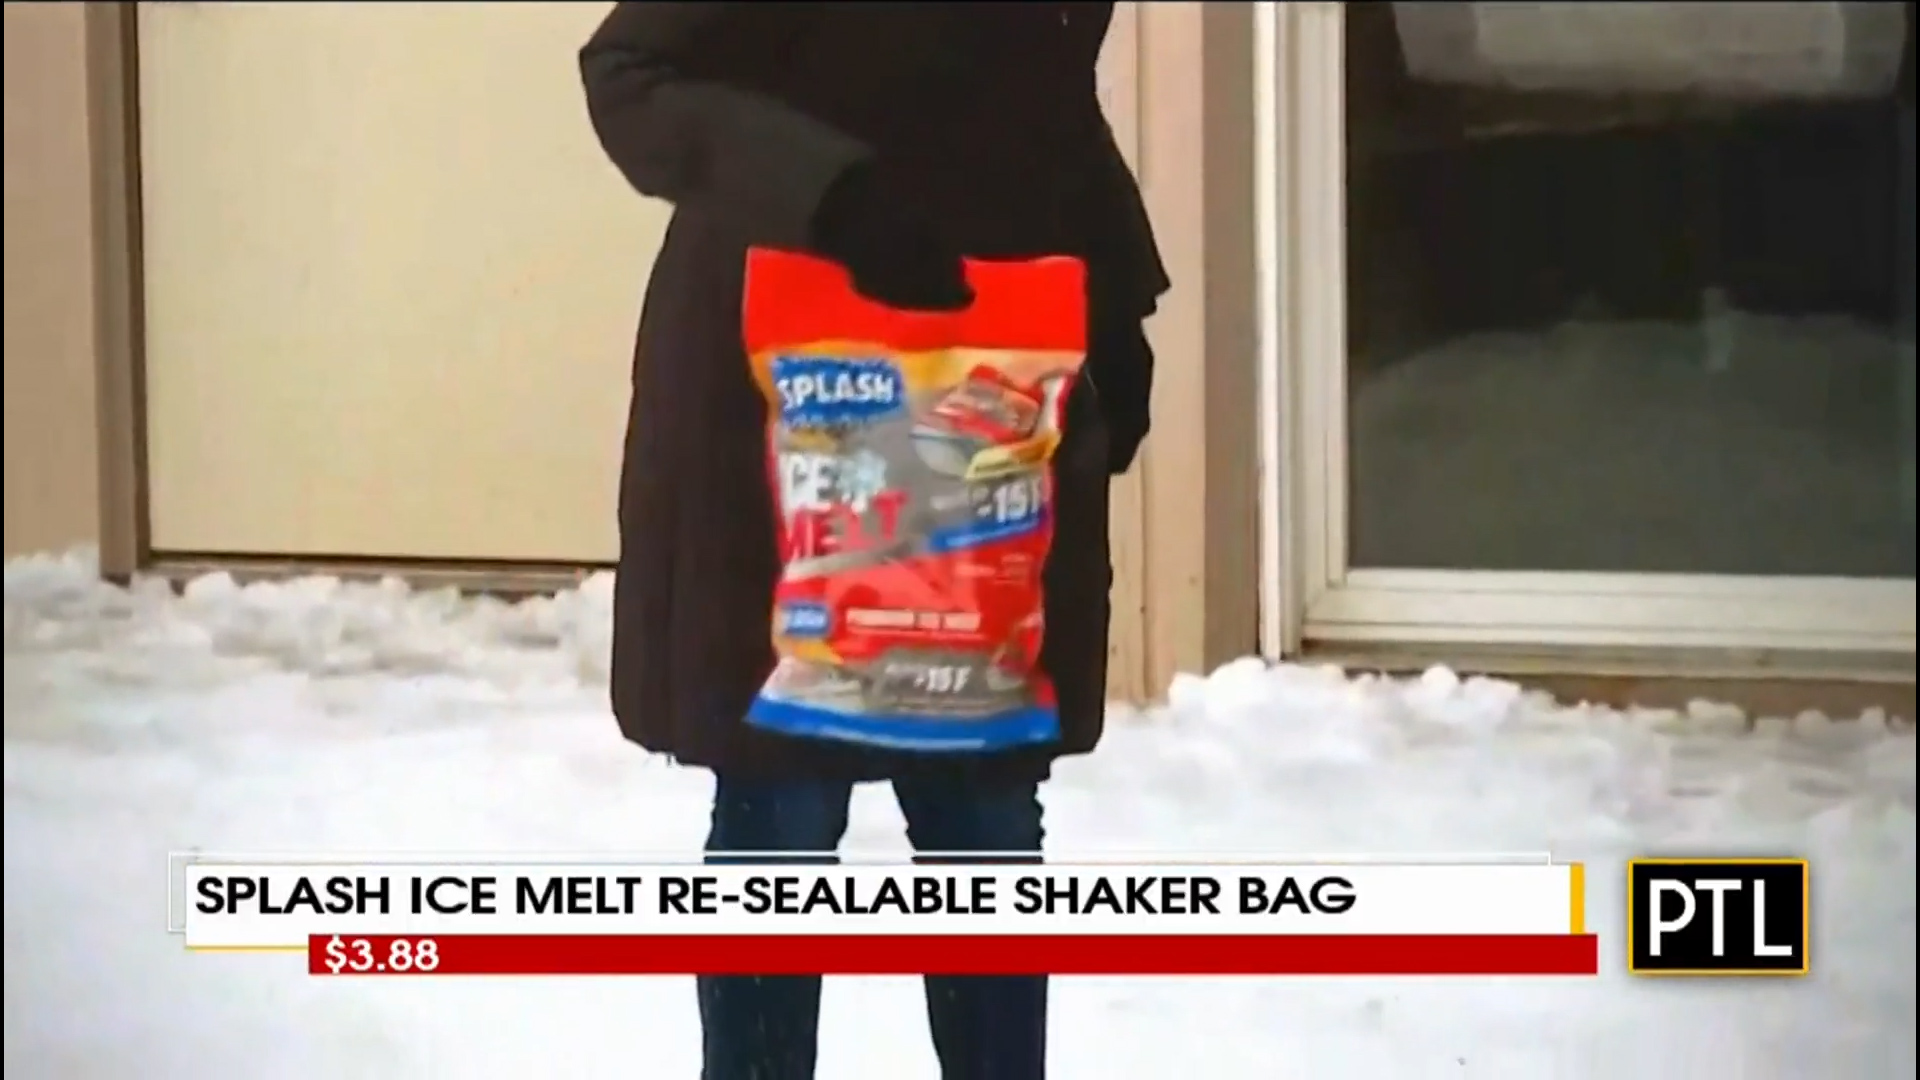 SPLASH ICE MELT RE-SEALABLE SHAKER BAG - $3.88Shop Now